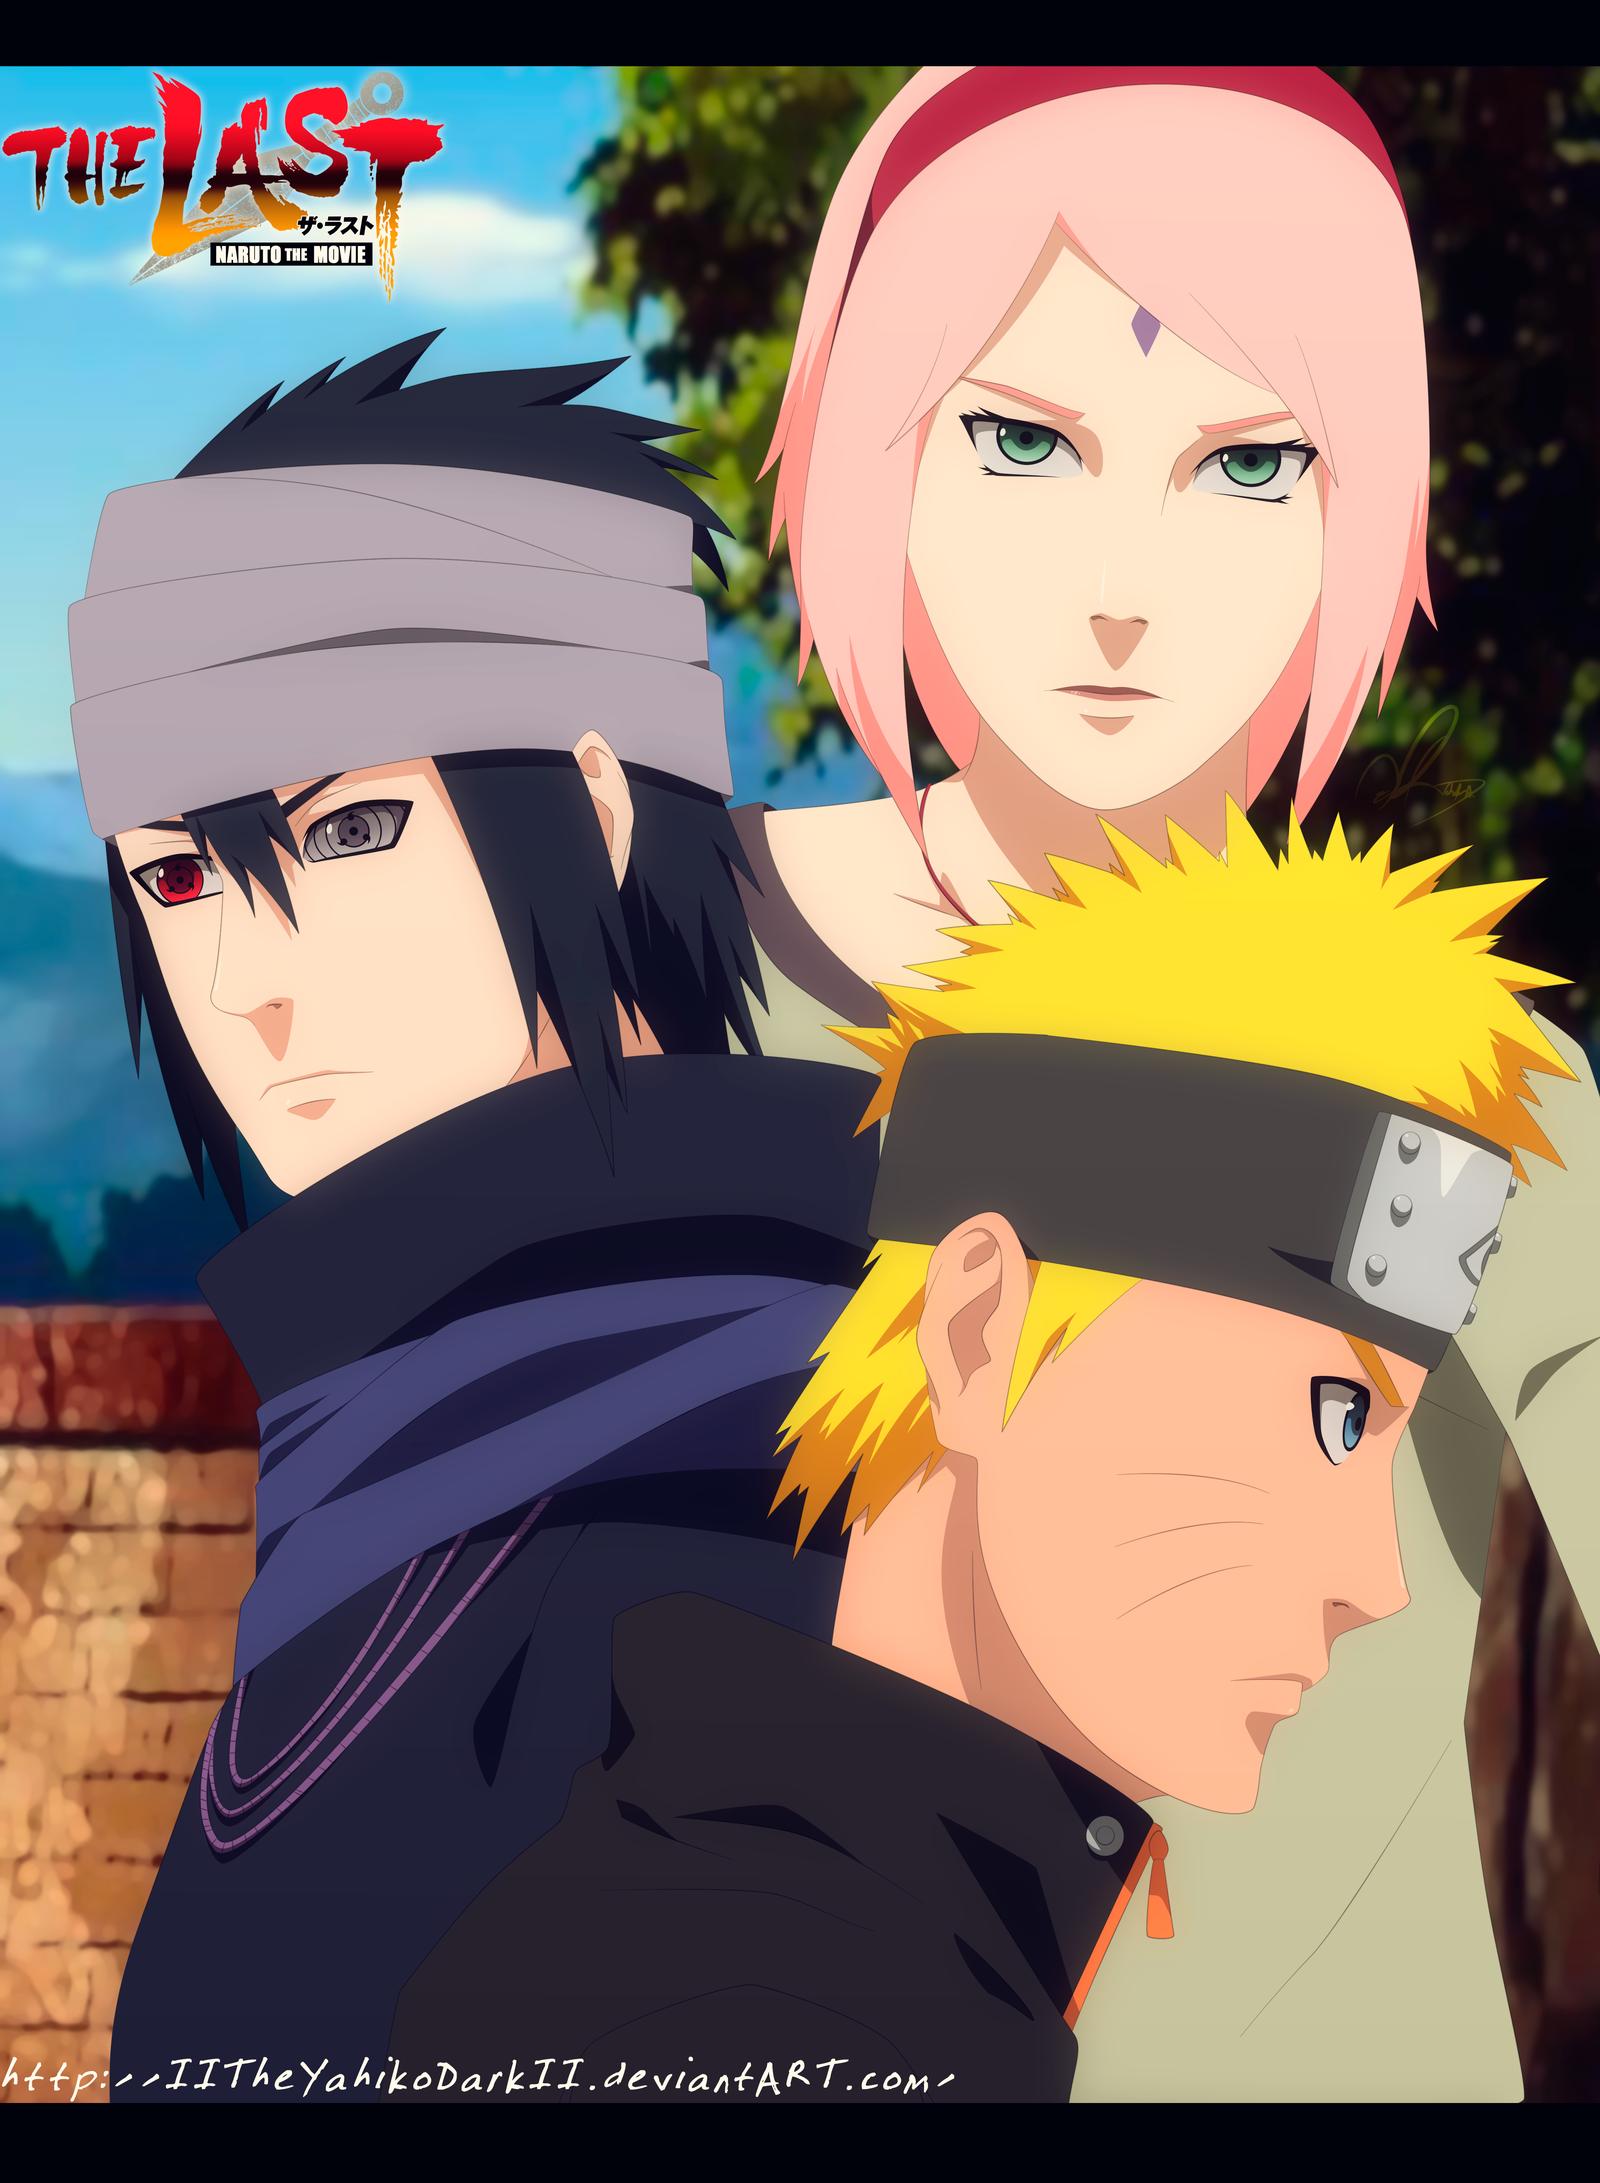 the+last+naruto+the+movie Naruto The Last Movie Legacy